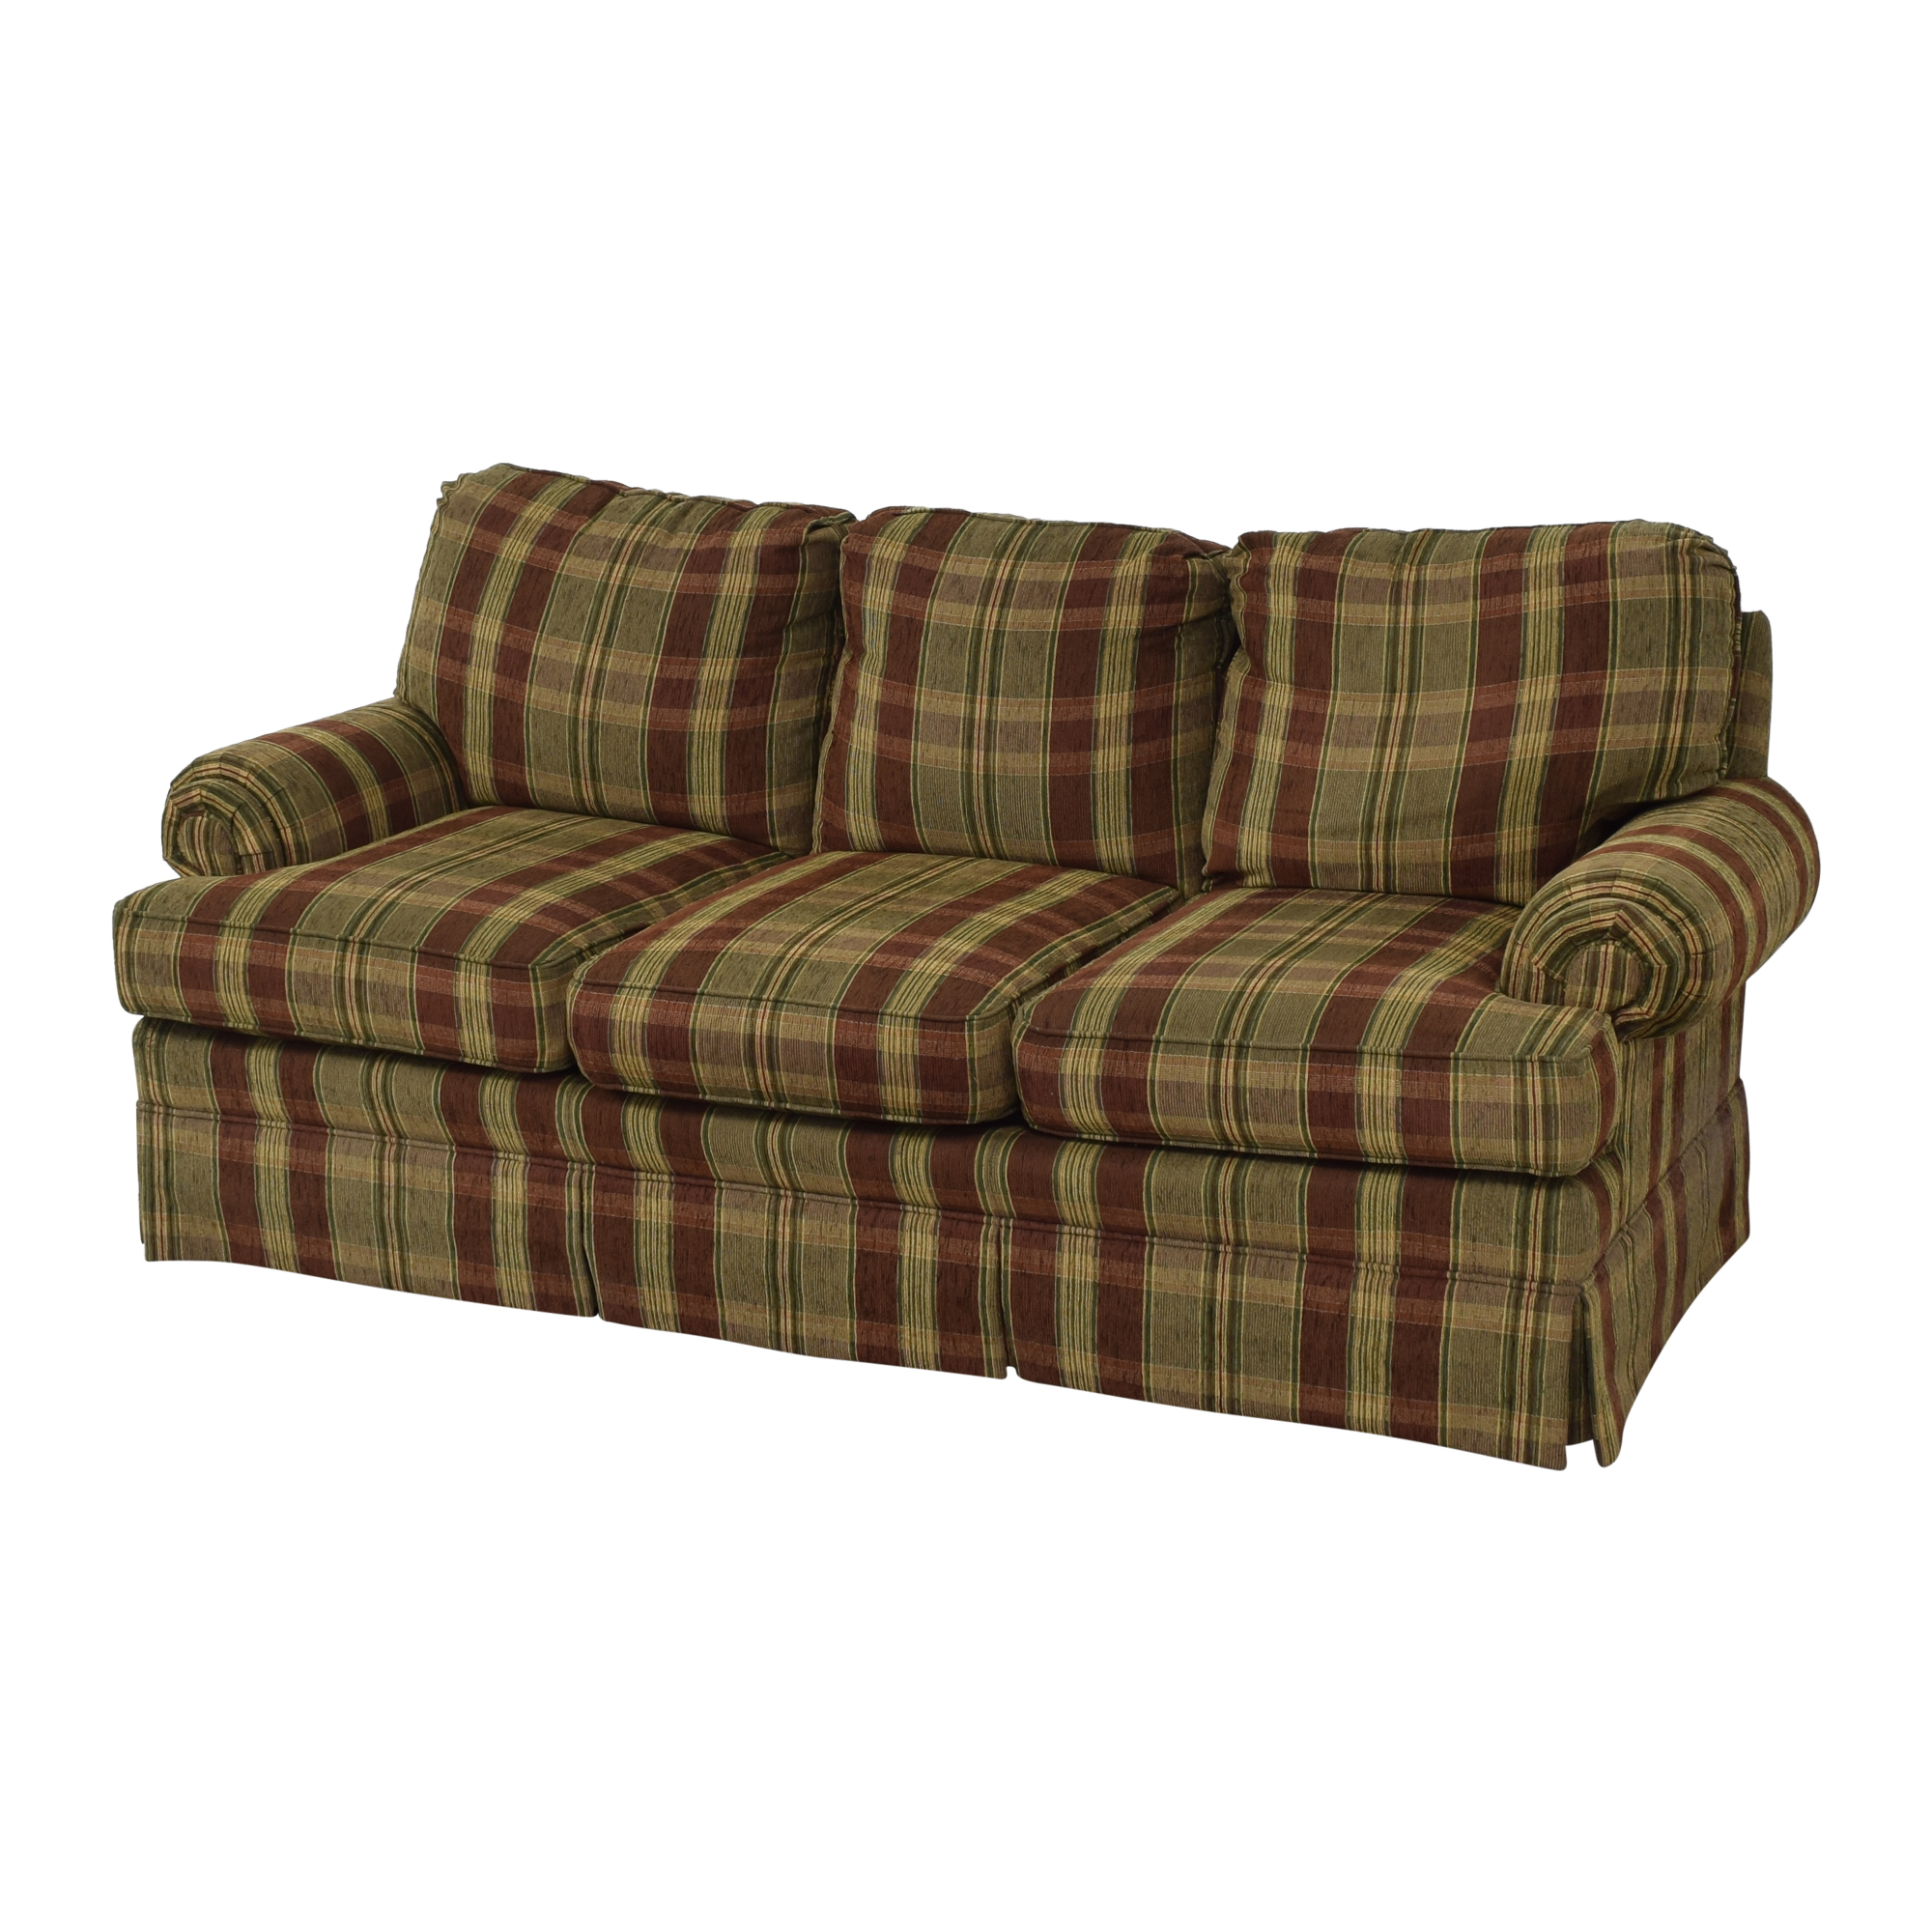 Thomasville Thomasville Plaid Skirted Sofa discount